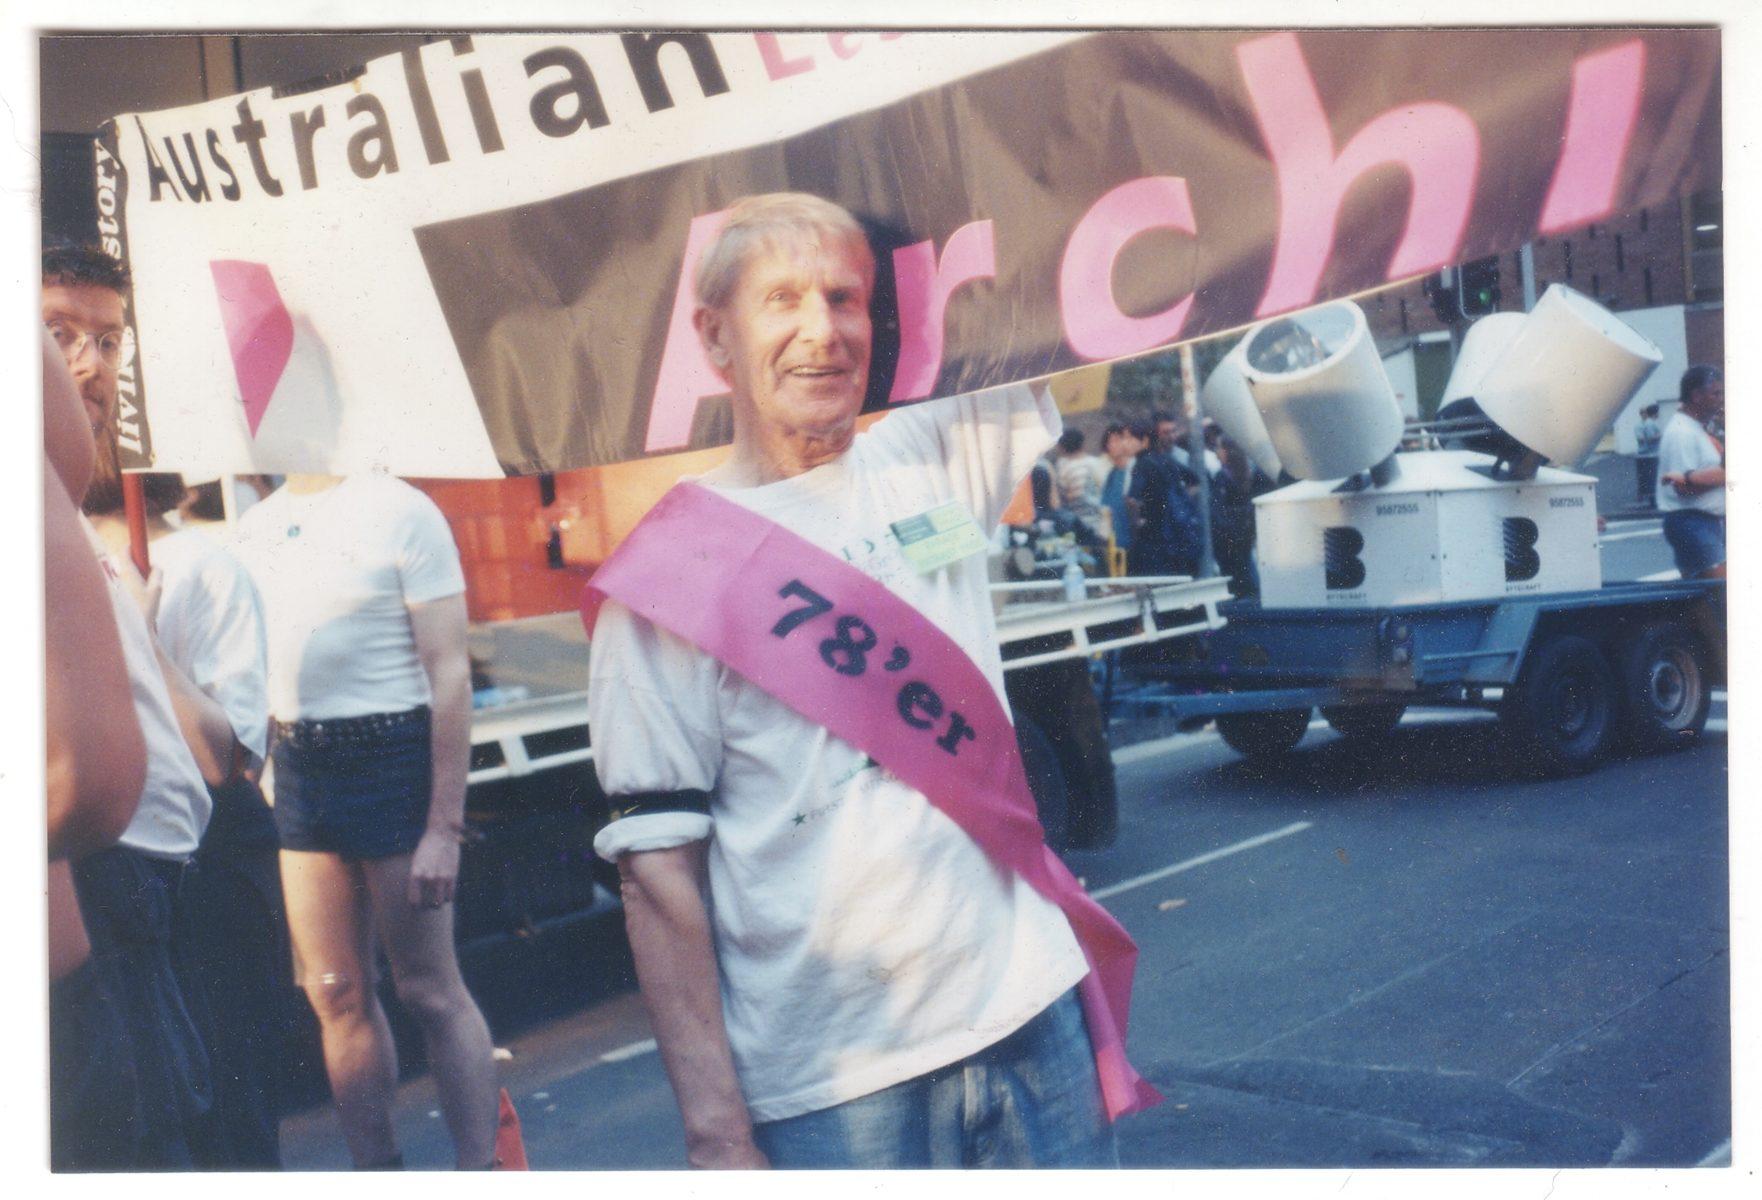 Ken Lovett with ALGA contingent at Sydney Gay and Lesbian Mardi Gras Parade, Sydney, 1998 (Photo: Murray Little)